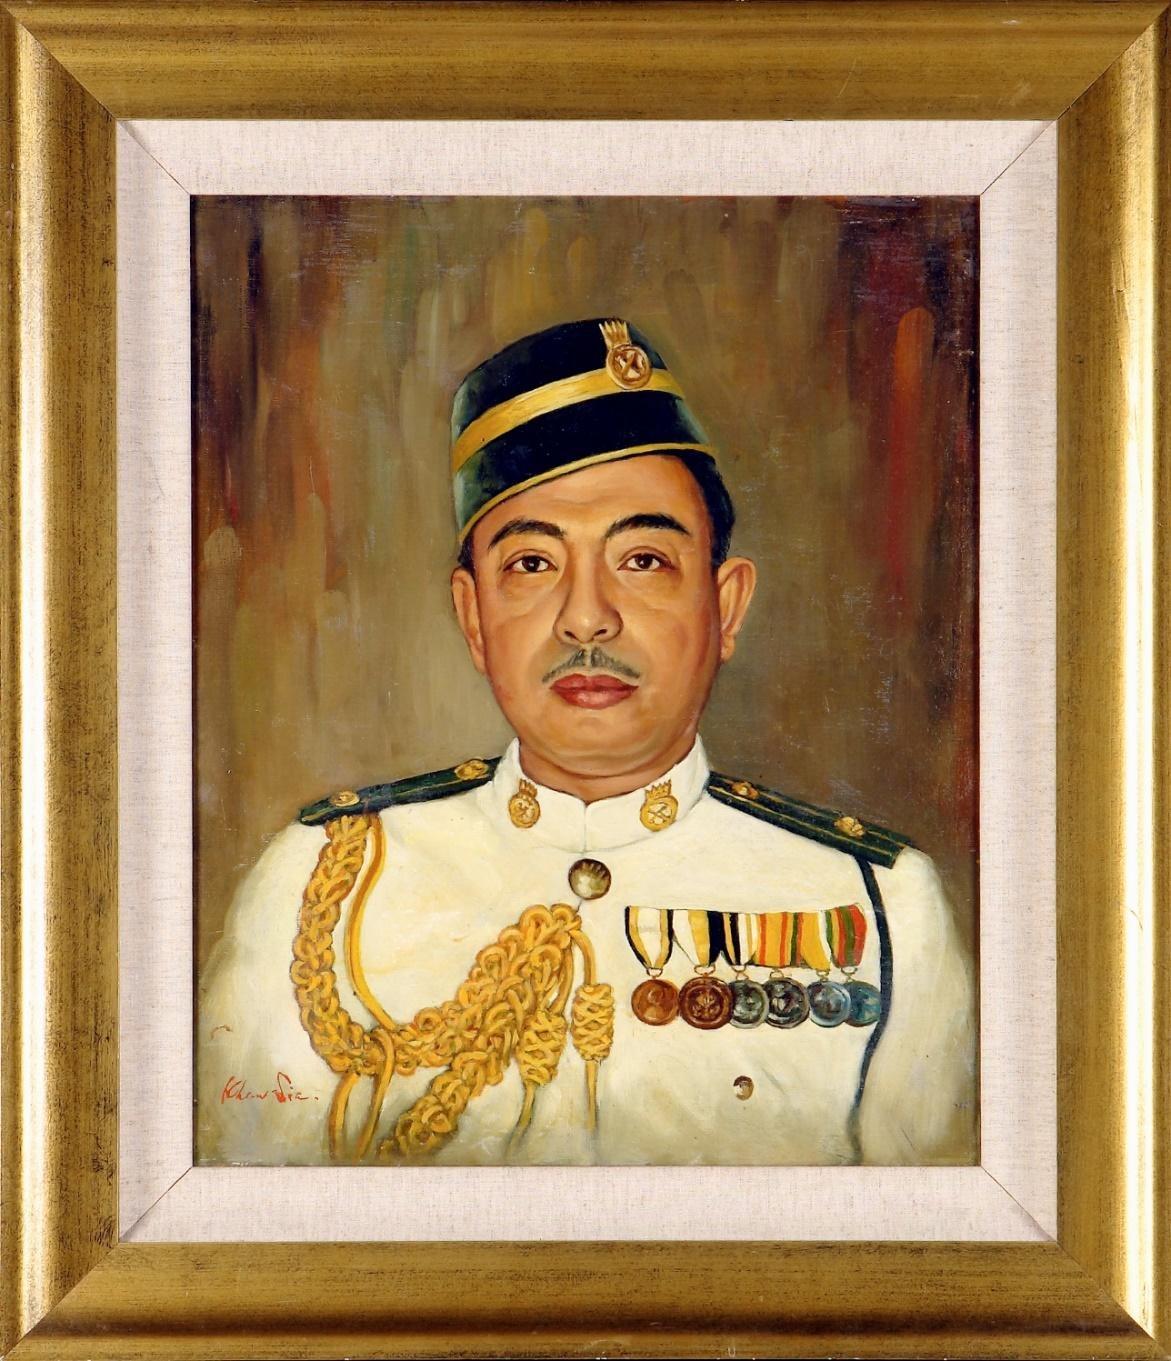 Sultan of Perak, 1966